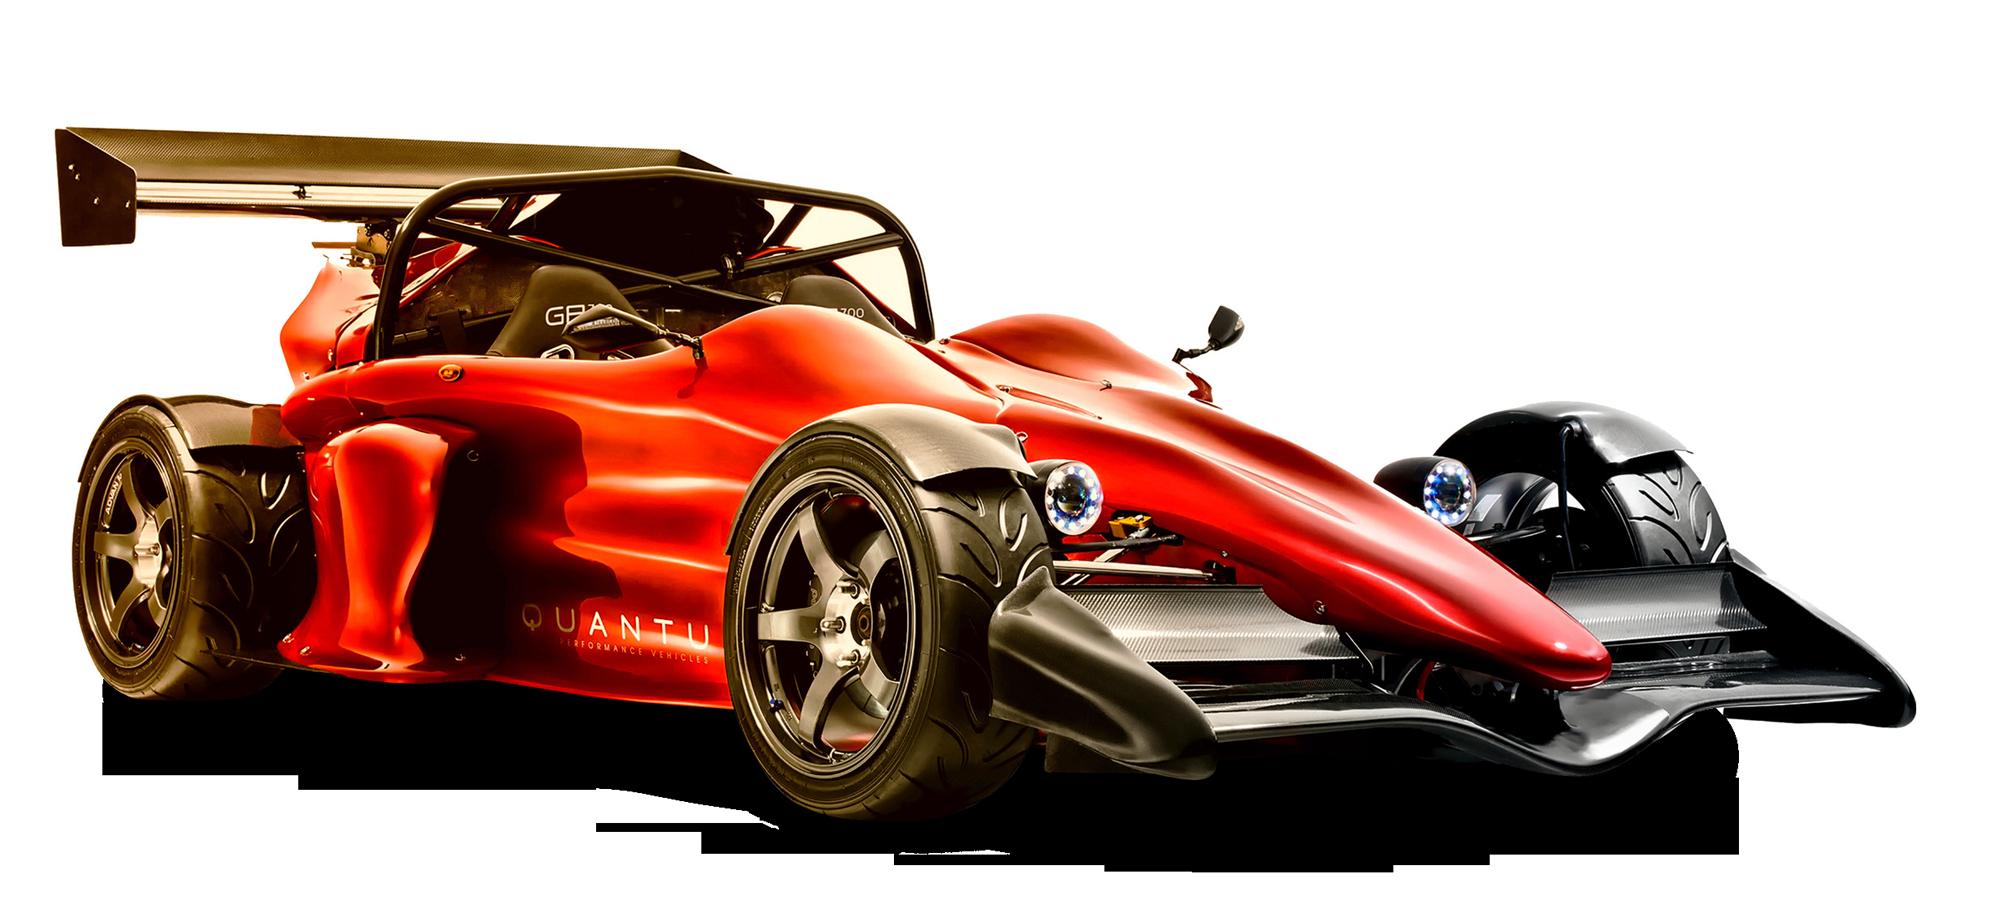 Quantum Gp700 Race Car Png Image Car Race Cars Luxury Cars Rolls Royce